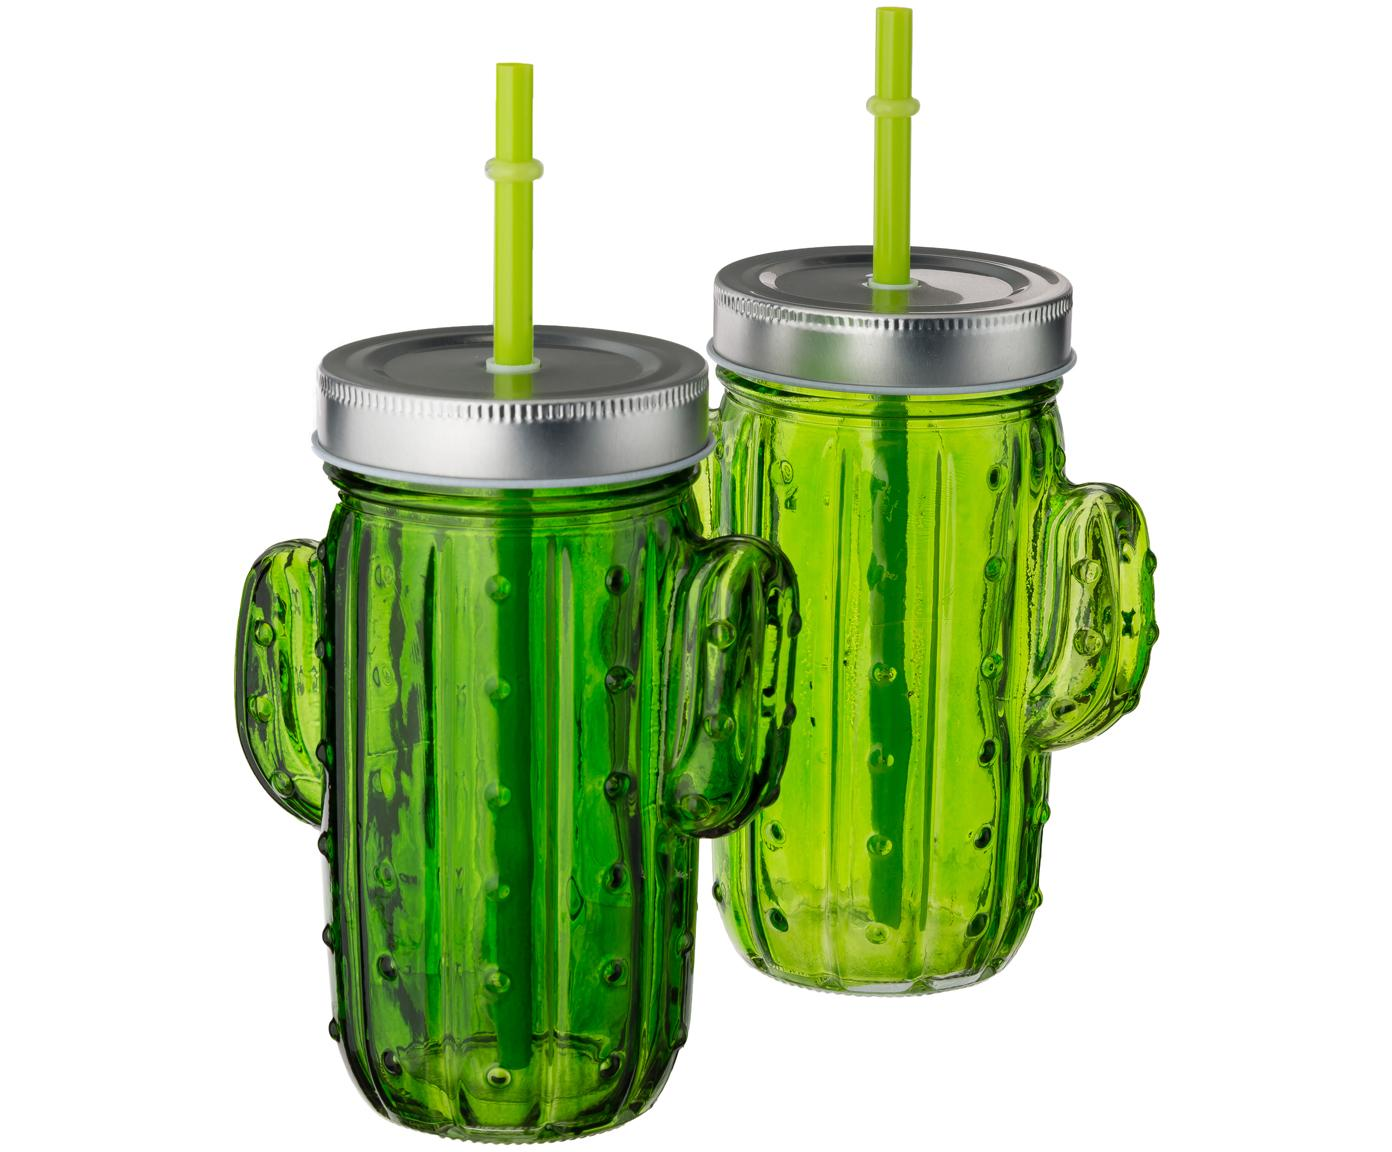 Trinkgläser-Set Kaktus, 2-tlg., Trinkglas: Glas, Deckel: Metall, Strohhalm: Kunststoff, Grüntöne, 12 x 15 cm